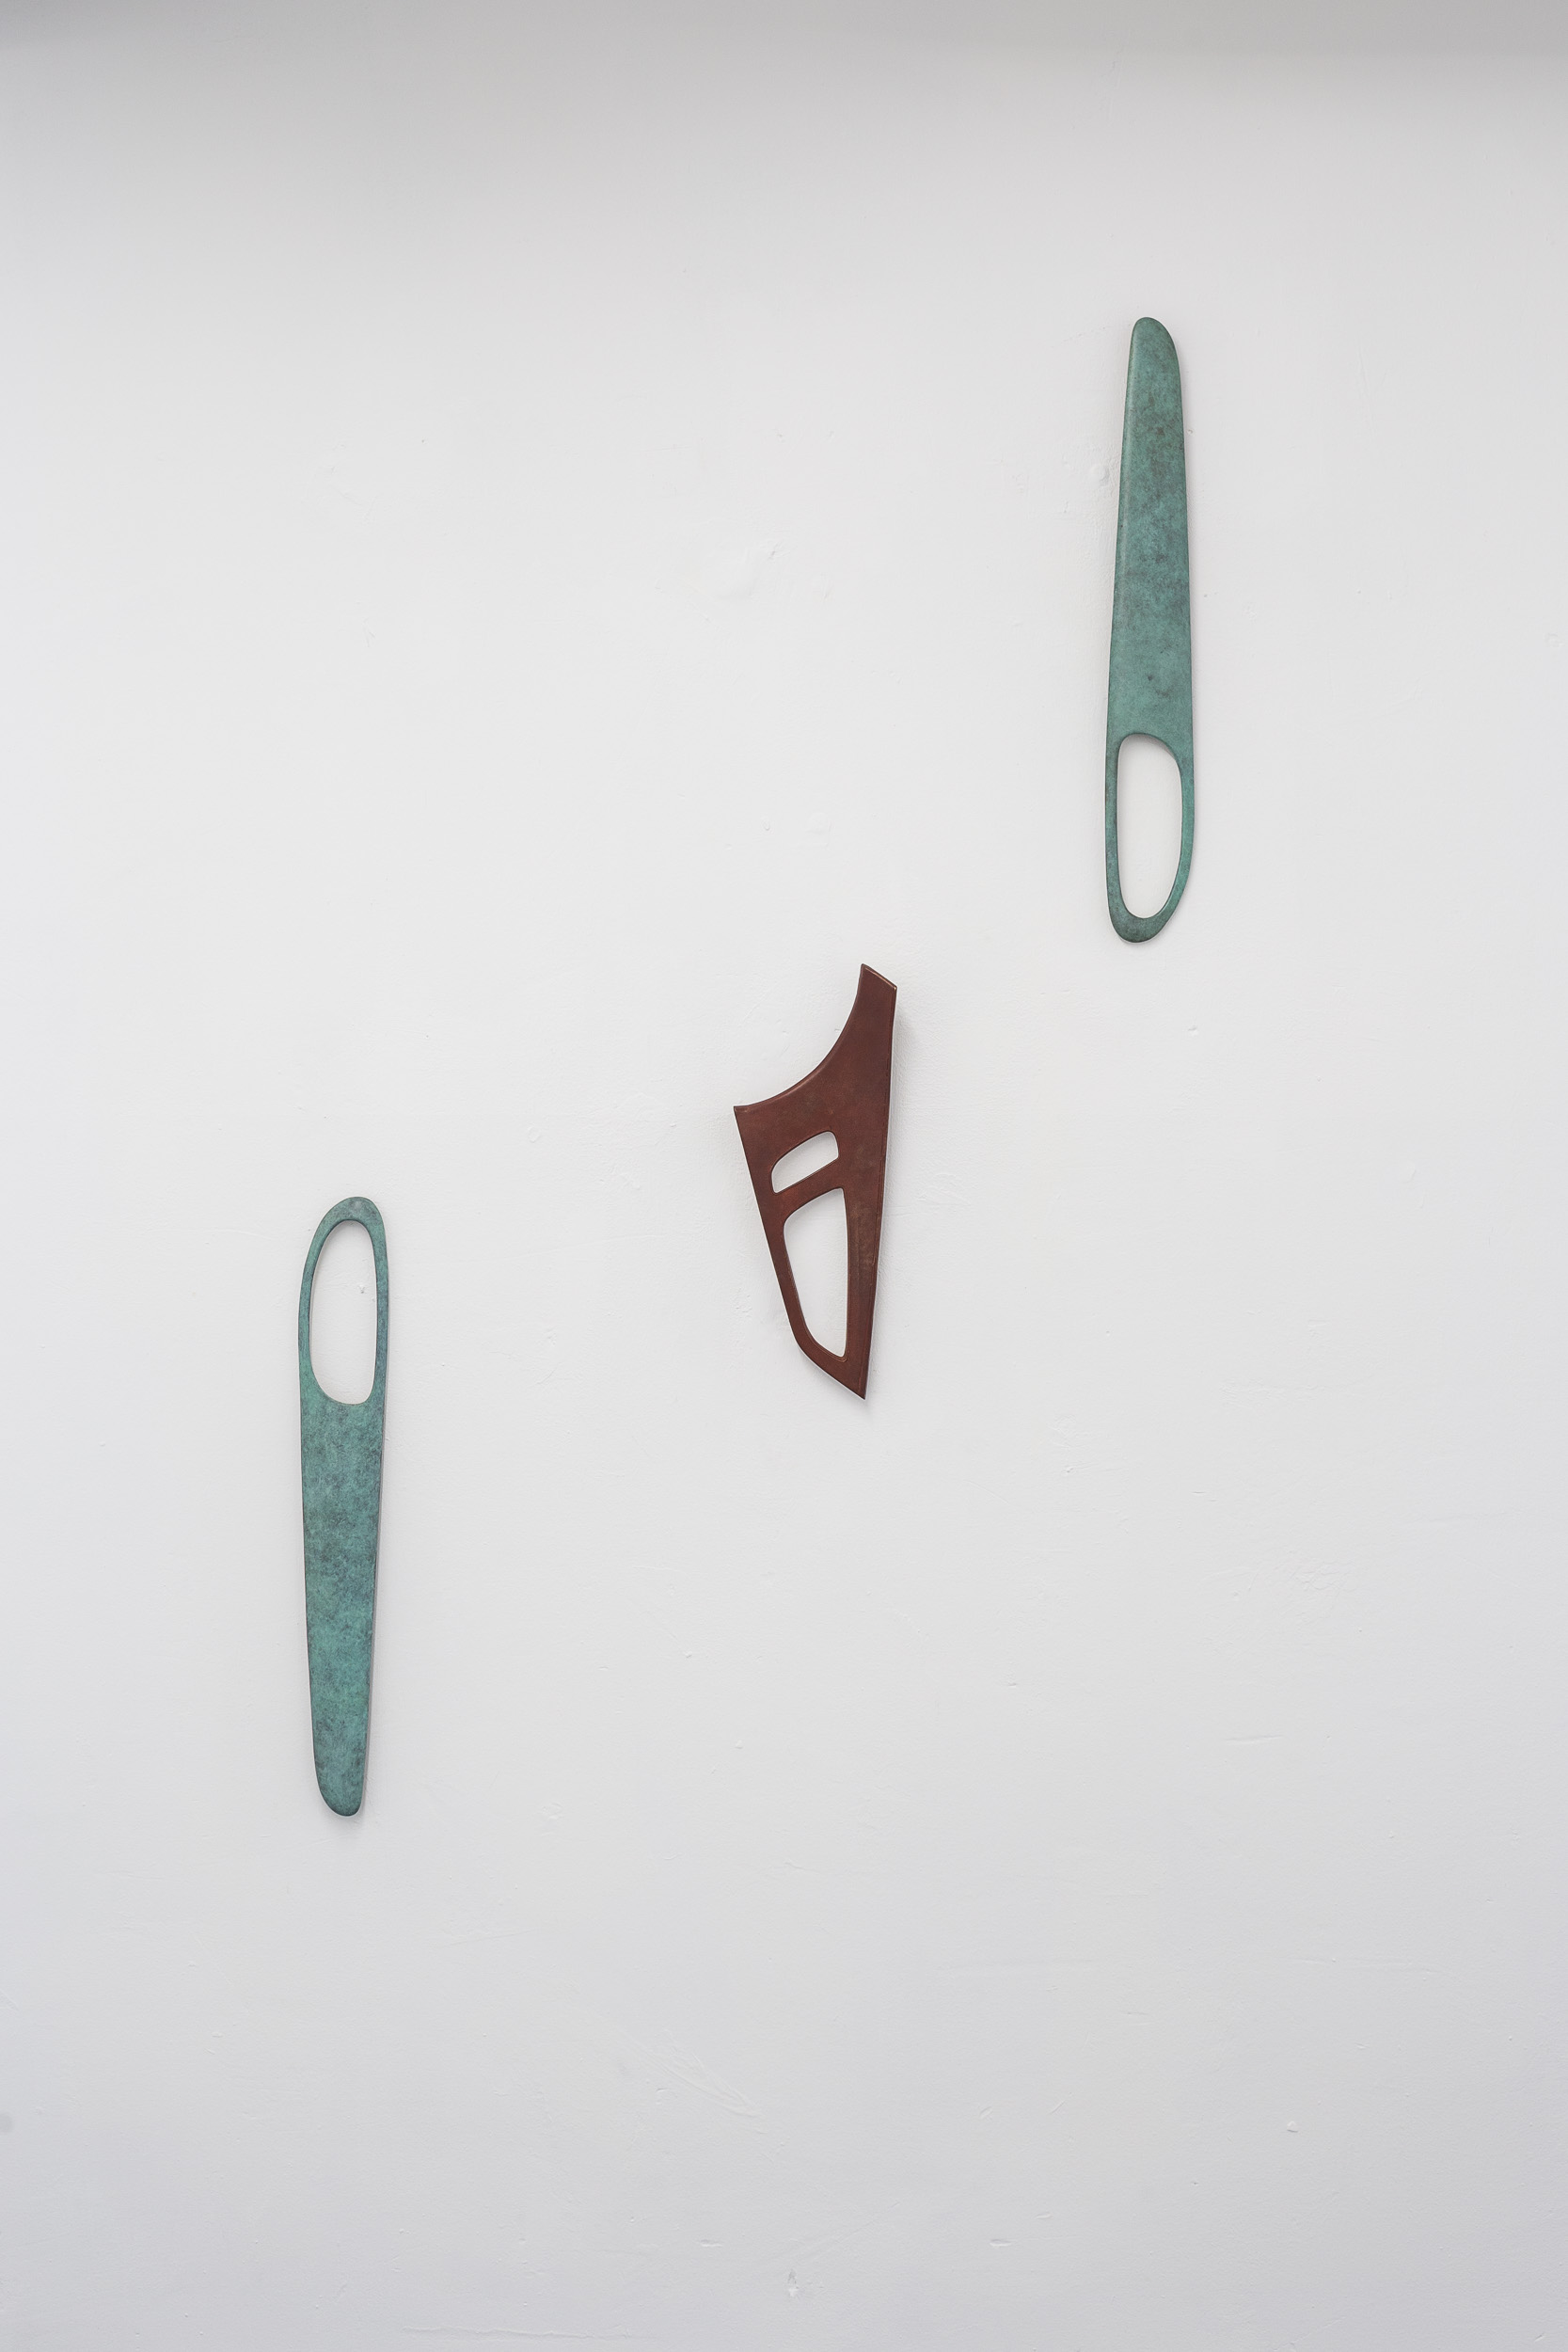 Alfredo Aceto, installation view  Photo: Kilian Bannwart